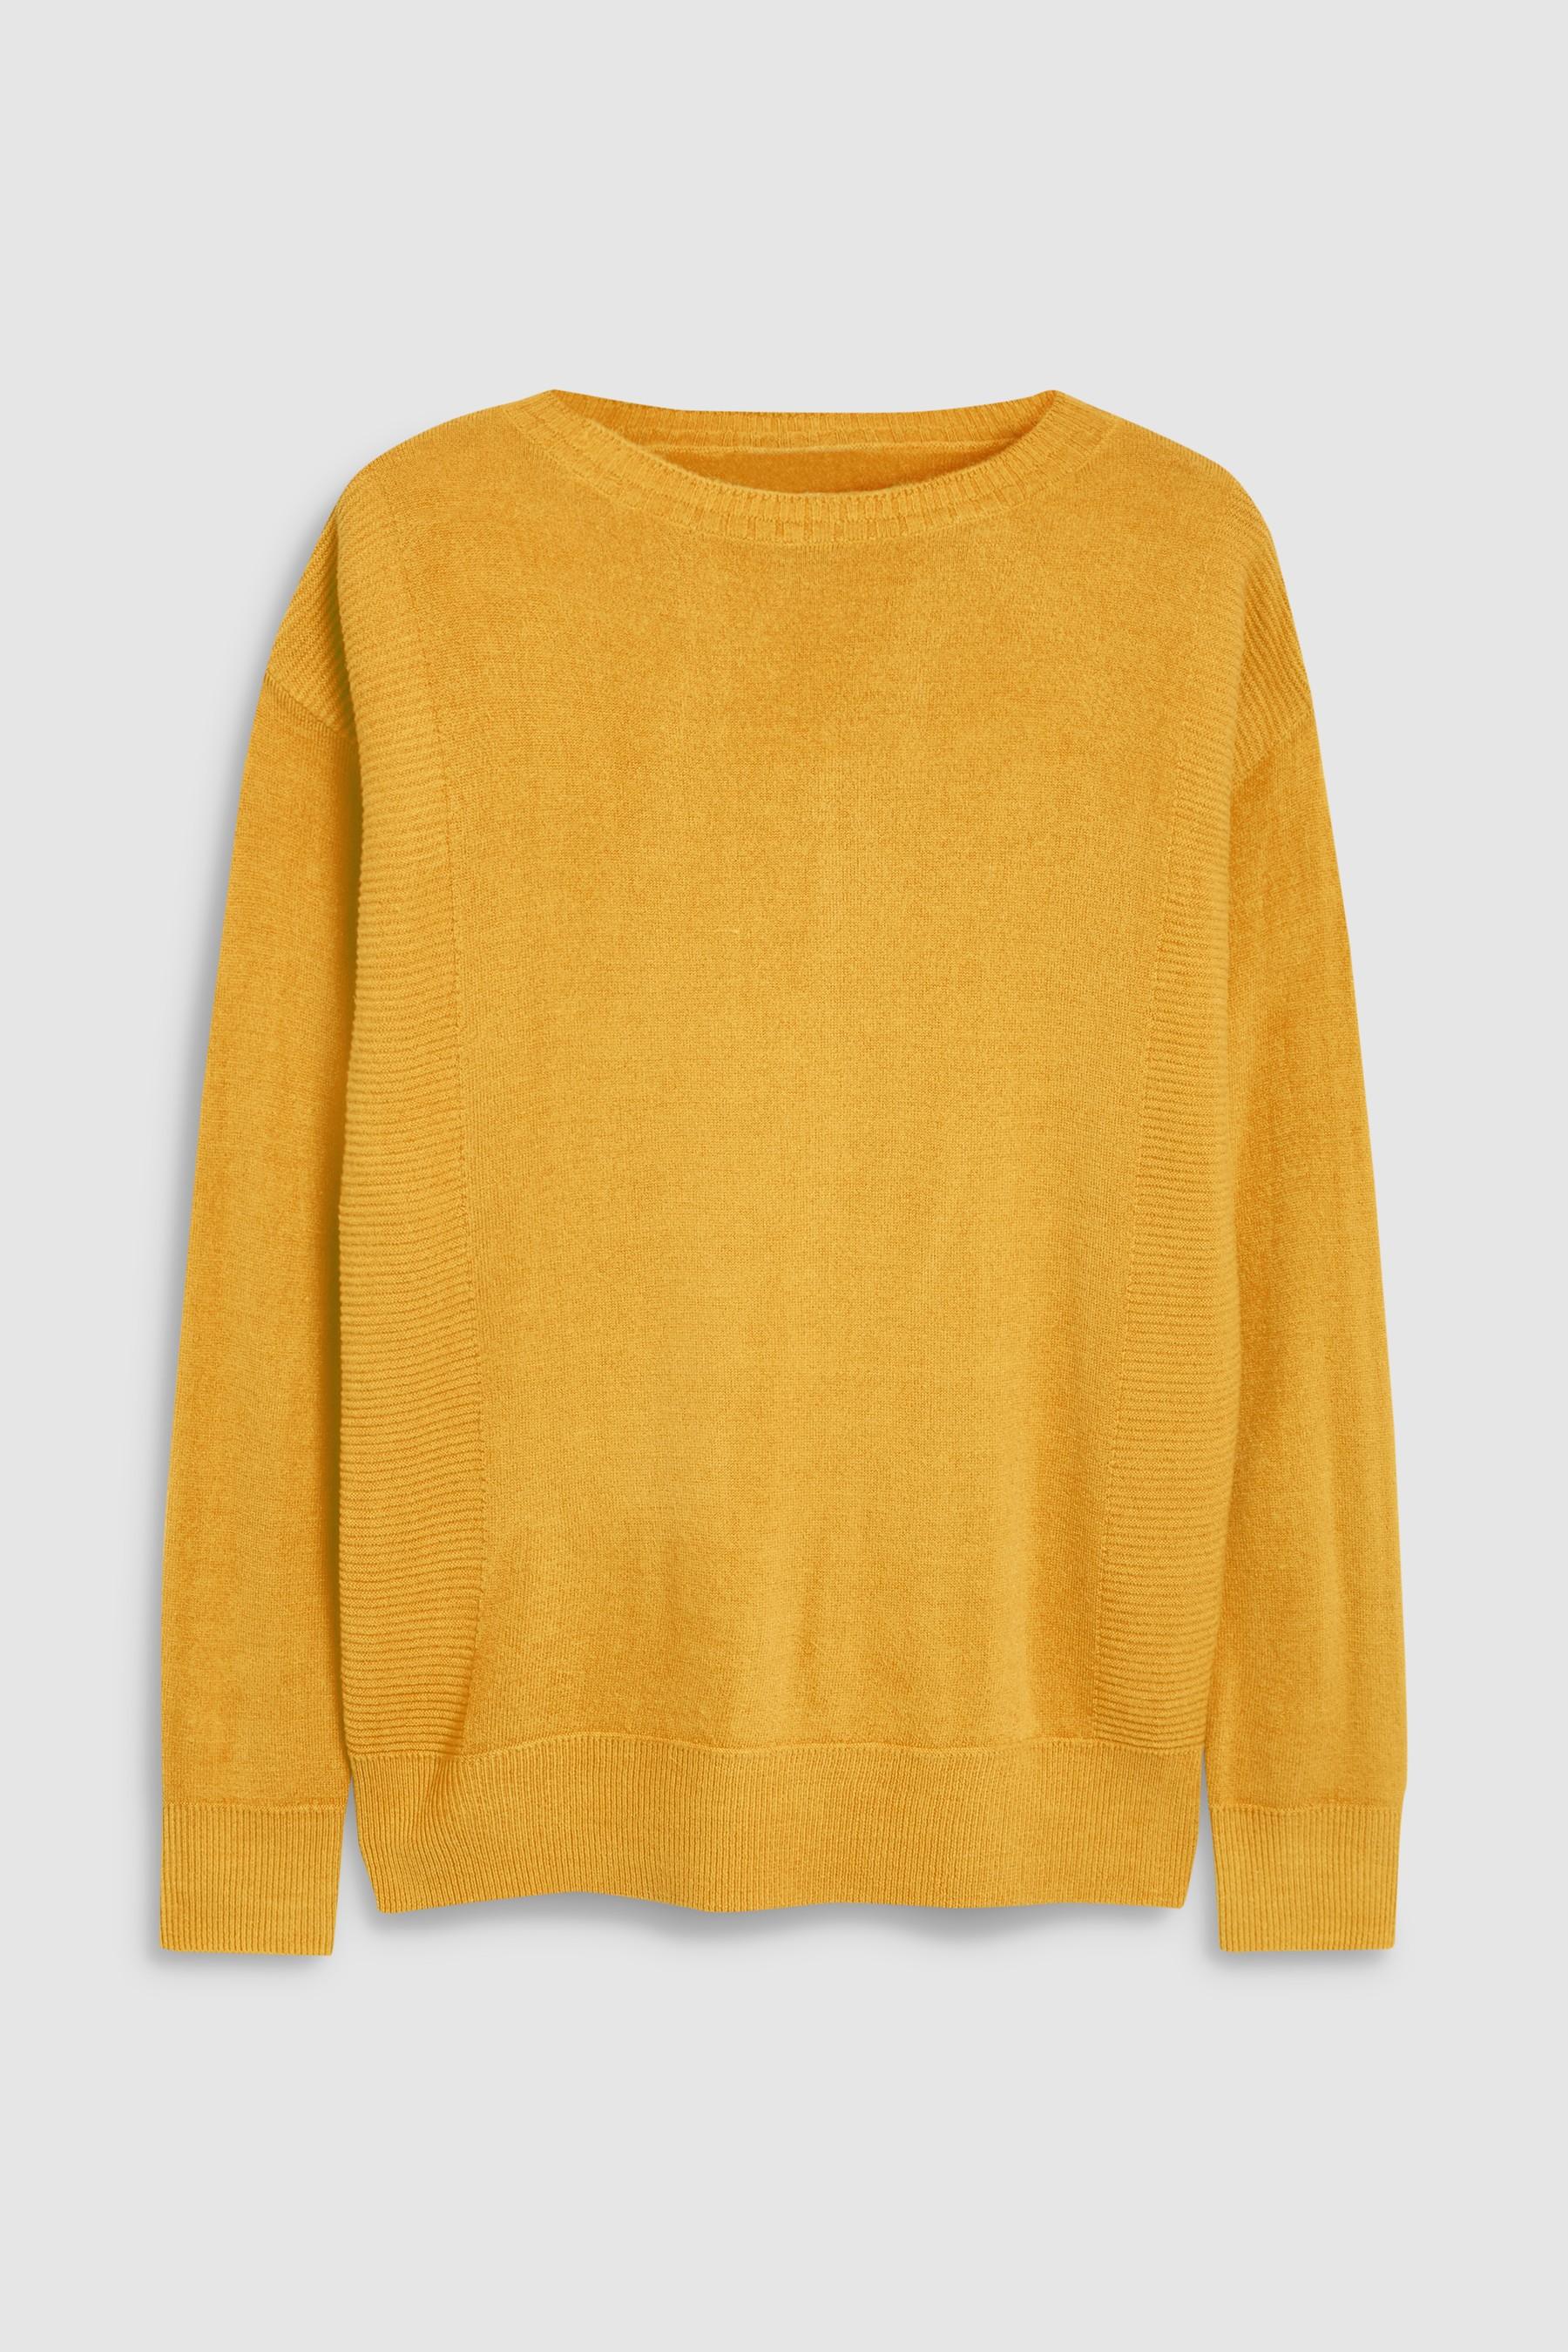 ebcf3cec2411 Womens Next Ochre Cosy Boat Neck Sweater - Yellow